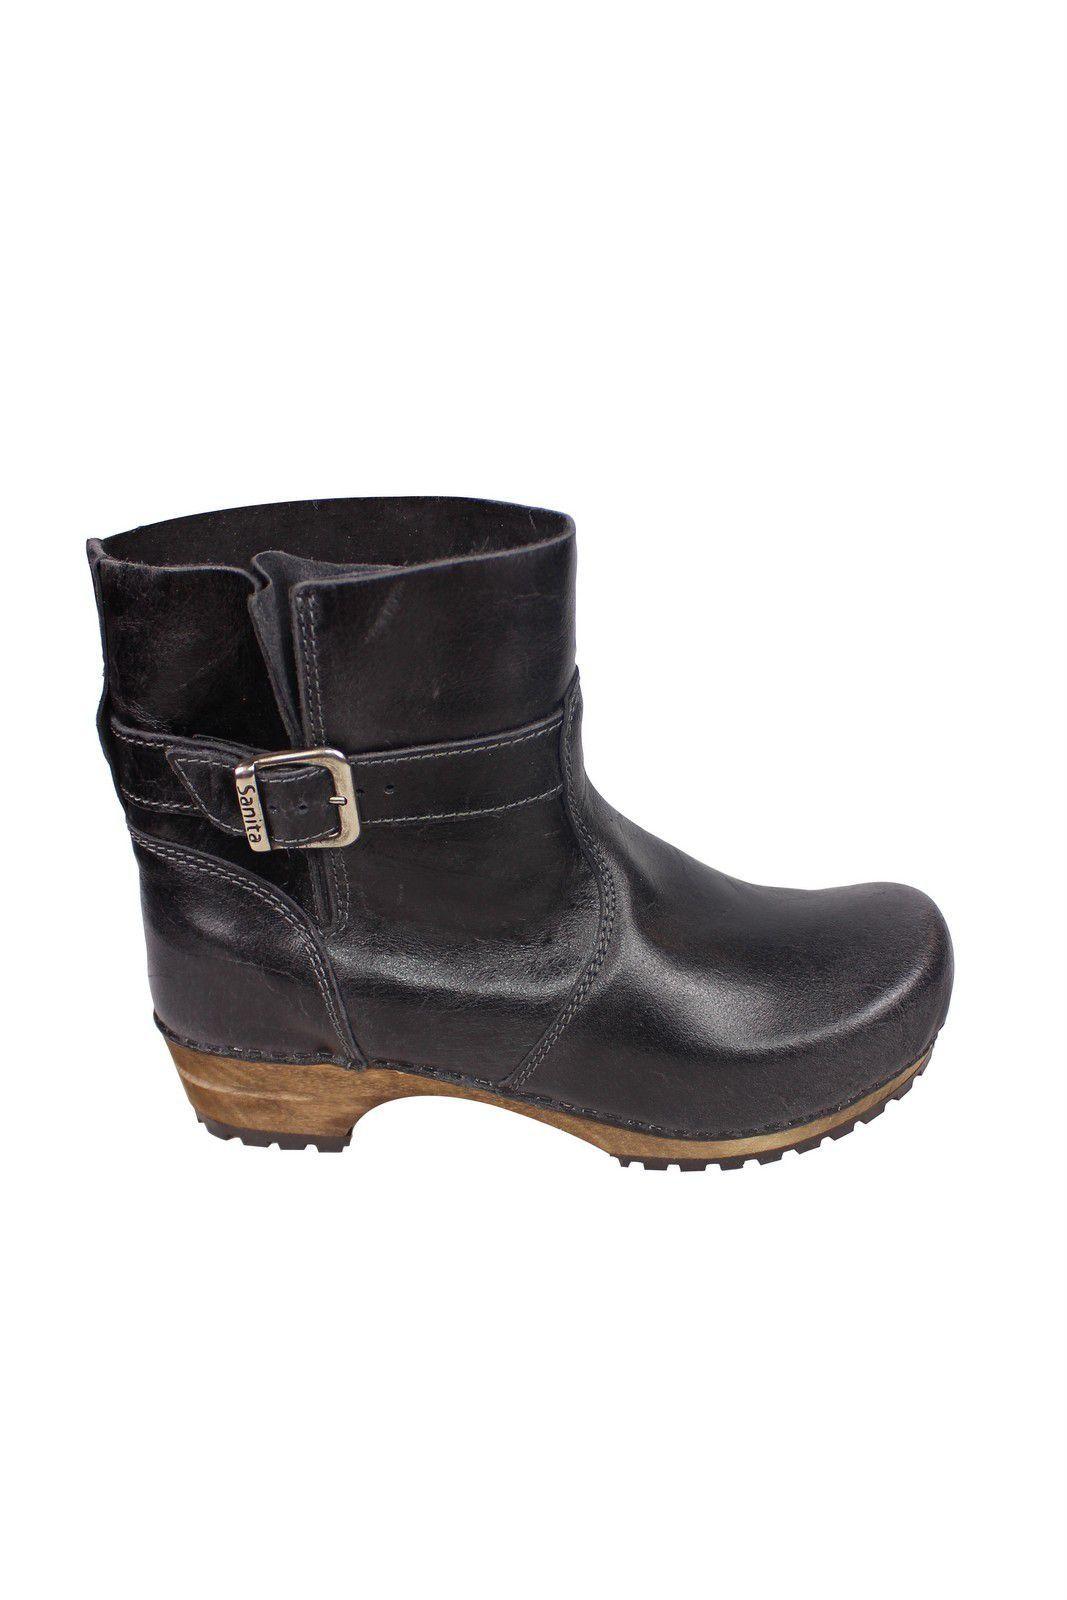 Sanita Mina Low Classic Clog Boot Black 452330 Side 2